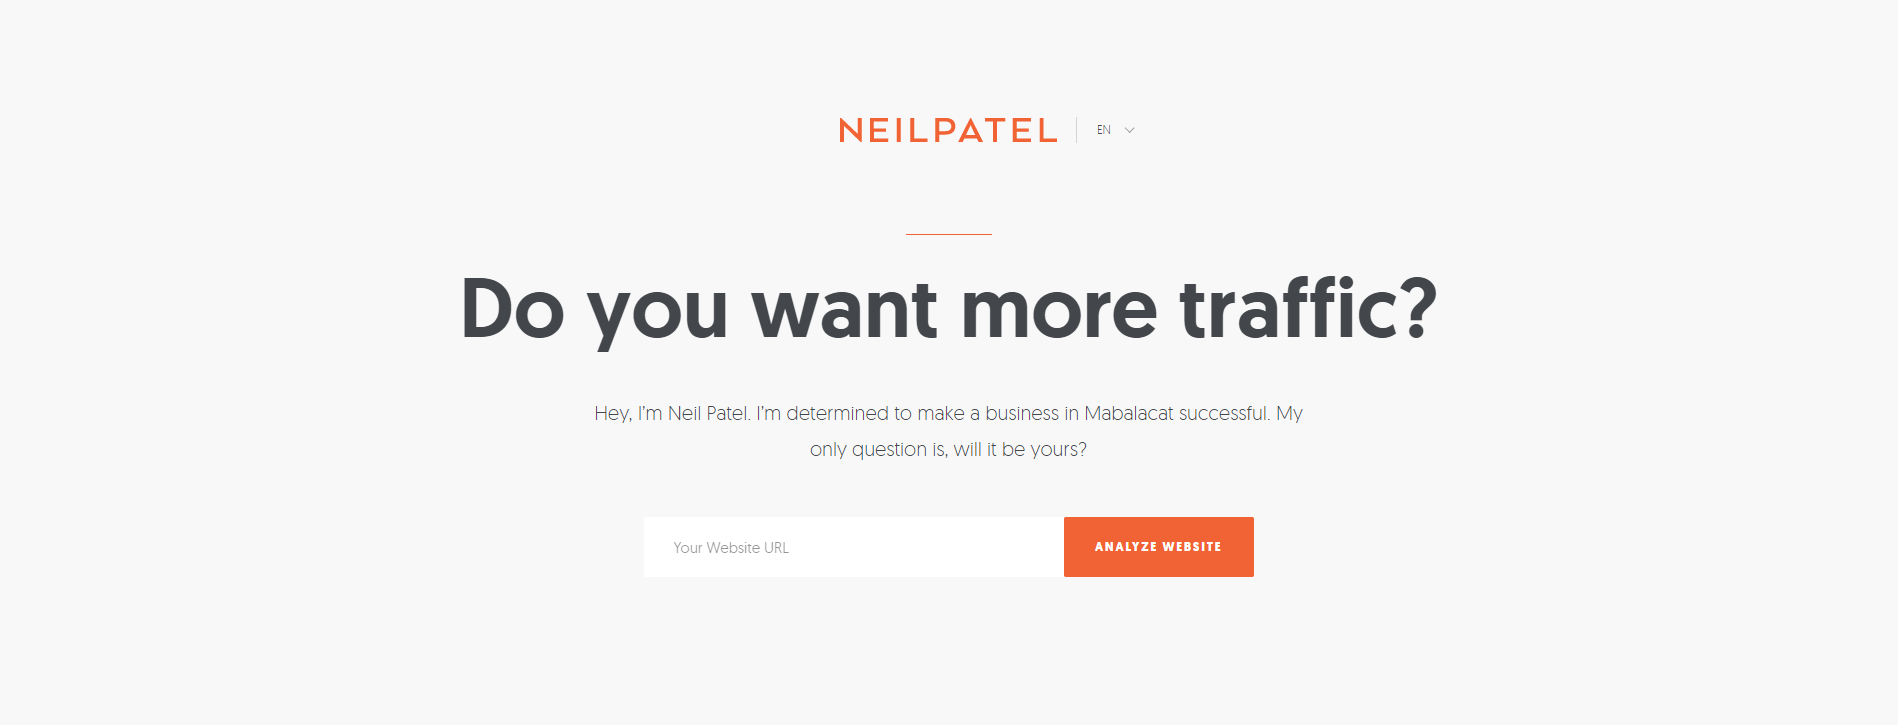 Neil Patel brand statement